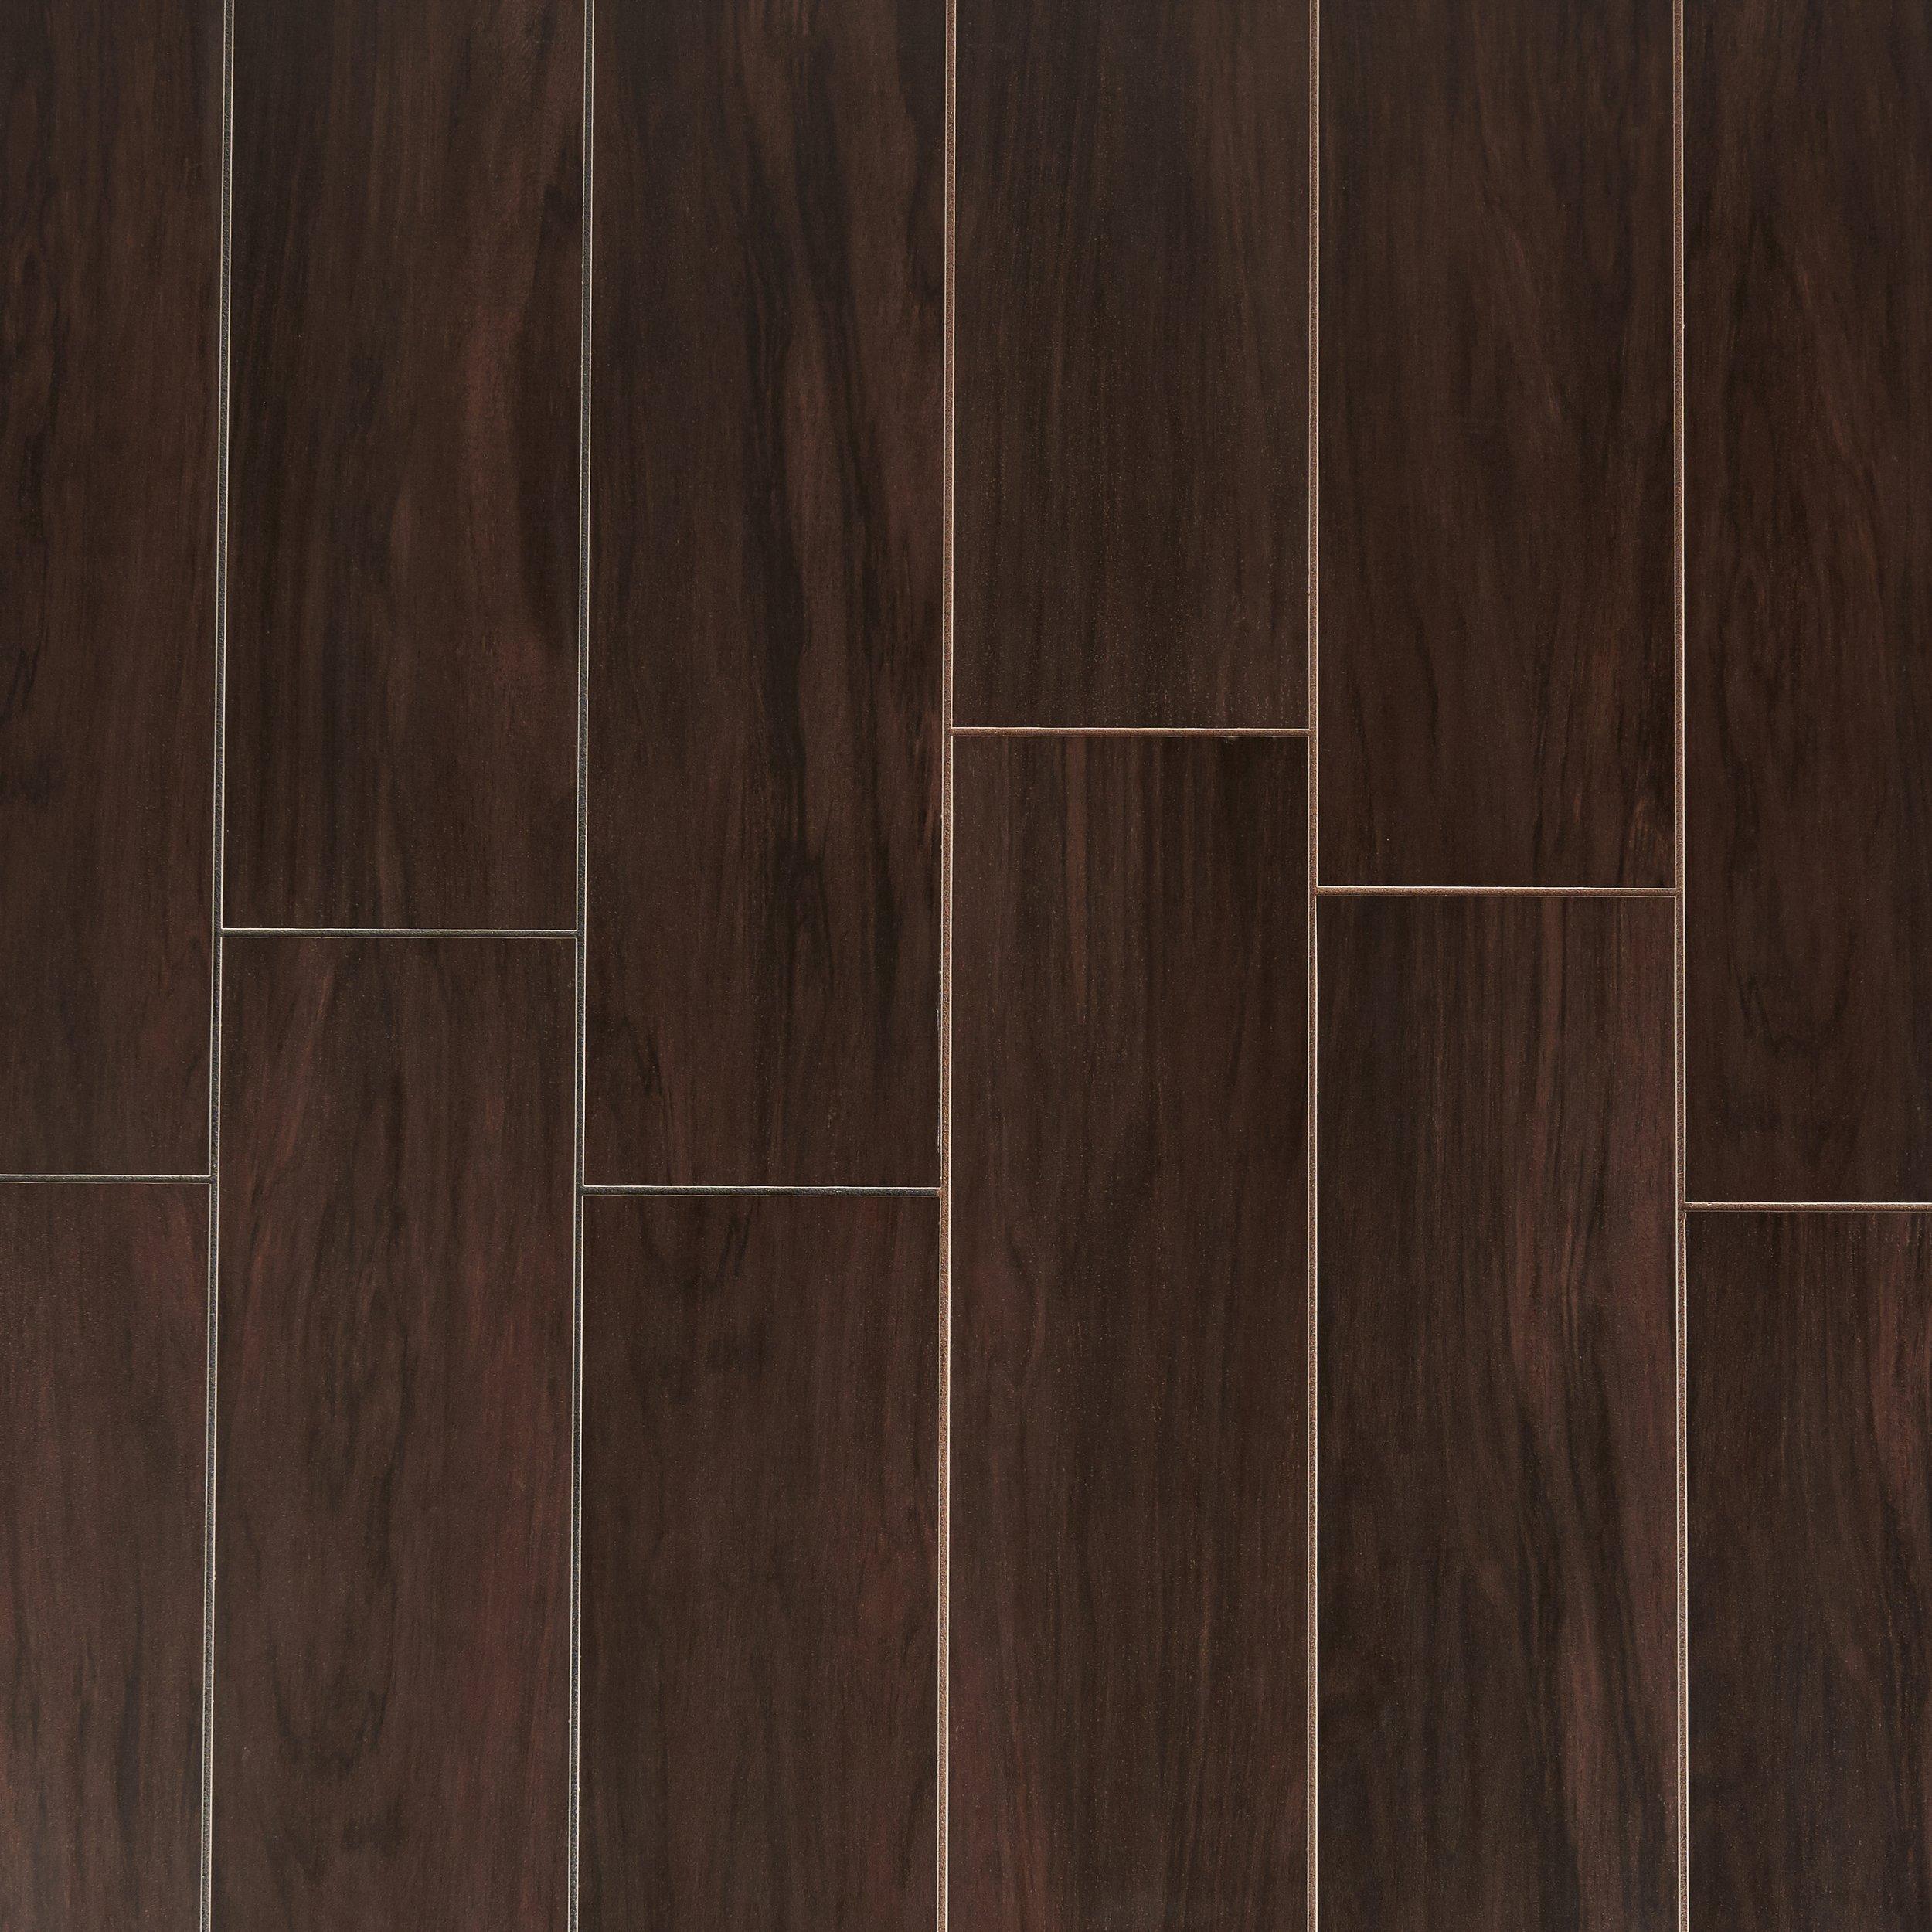 Porcelain wood tile image of dark brown wood porcelain for Floor and decor tile class